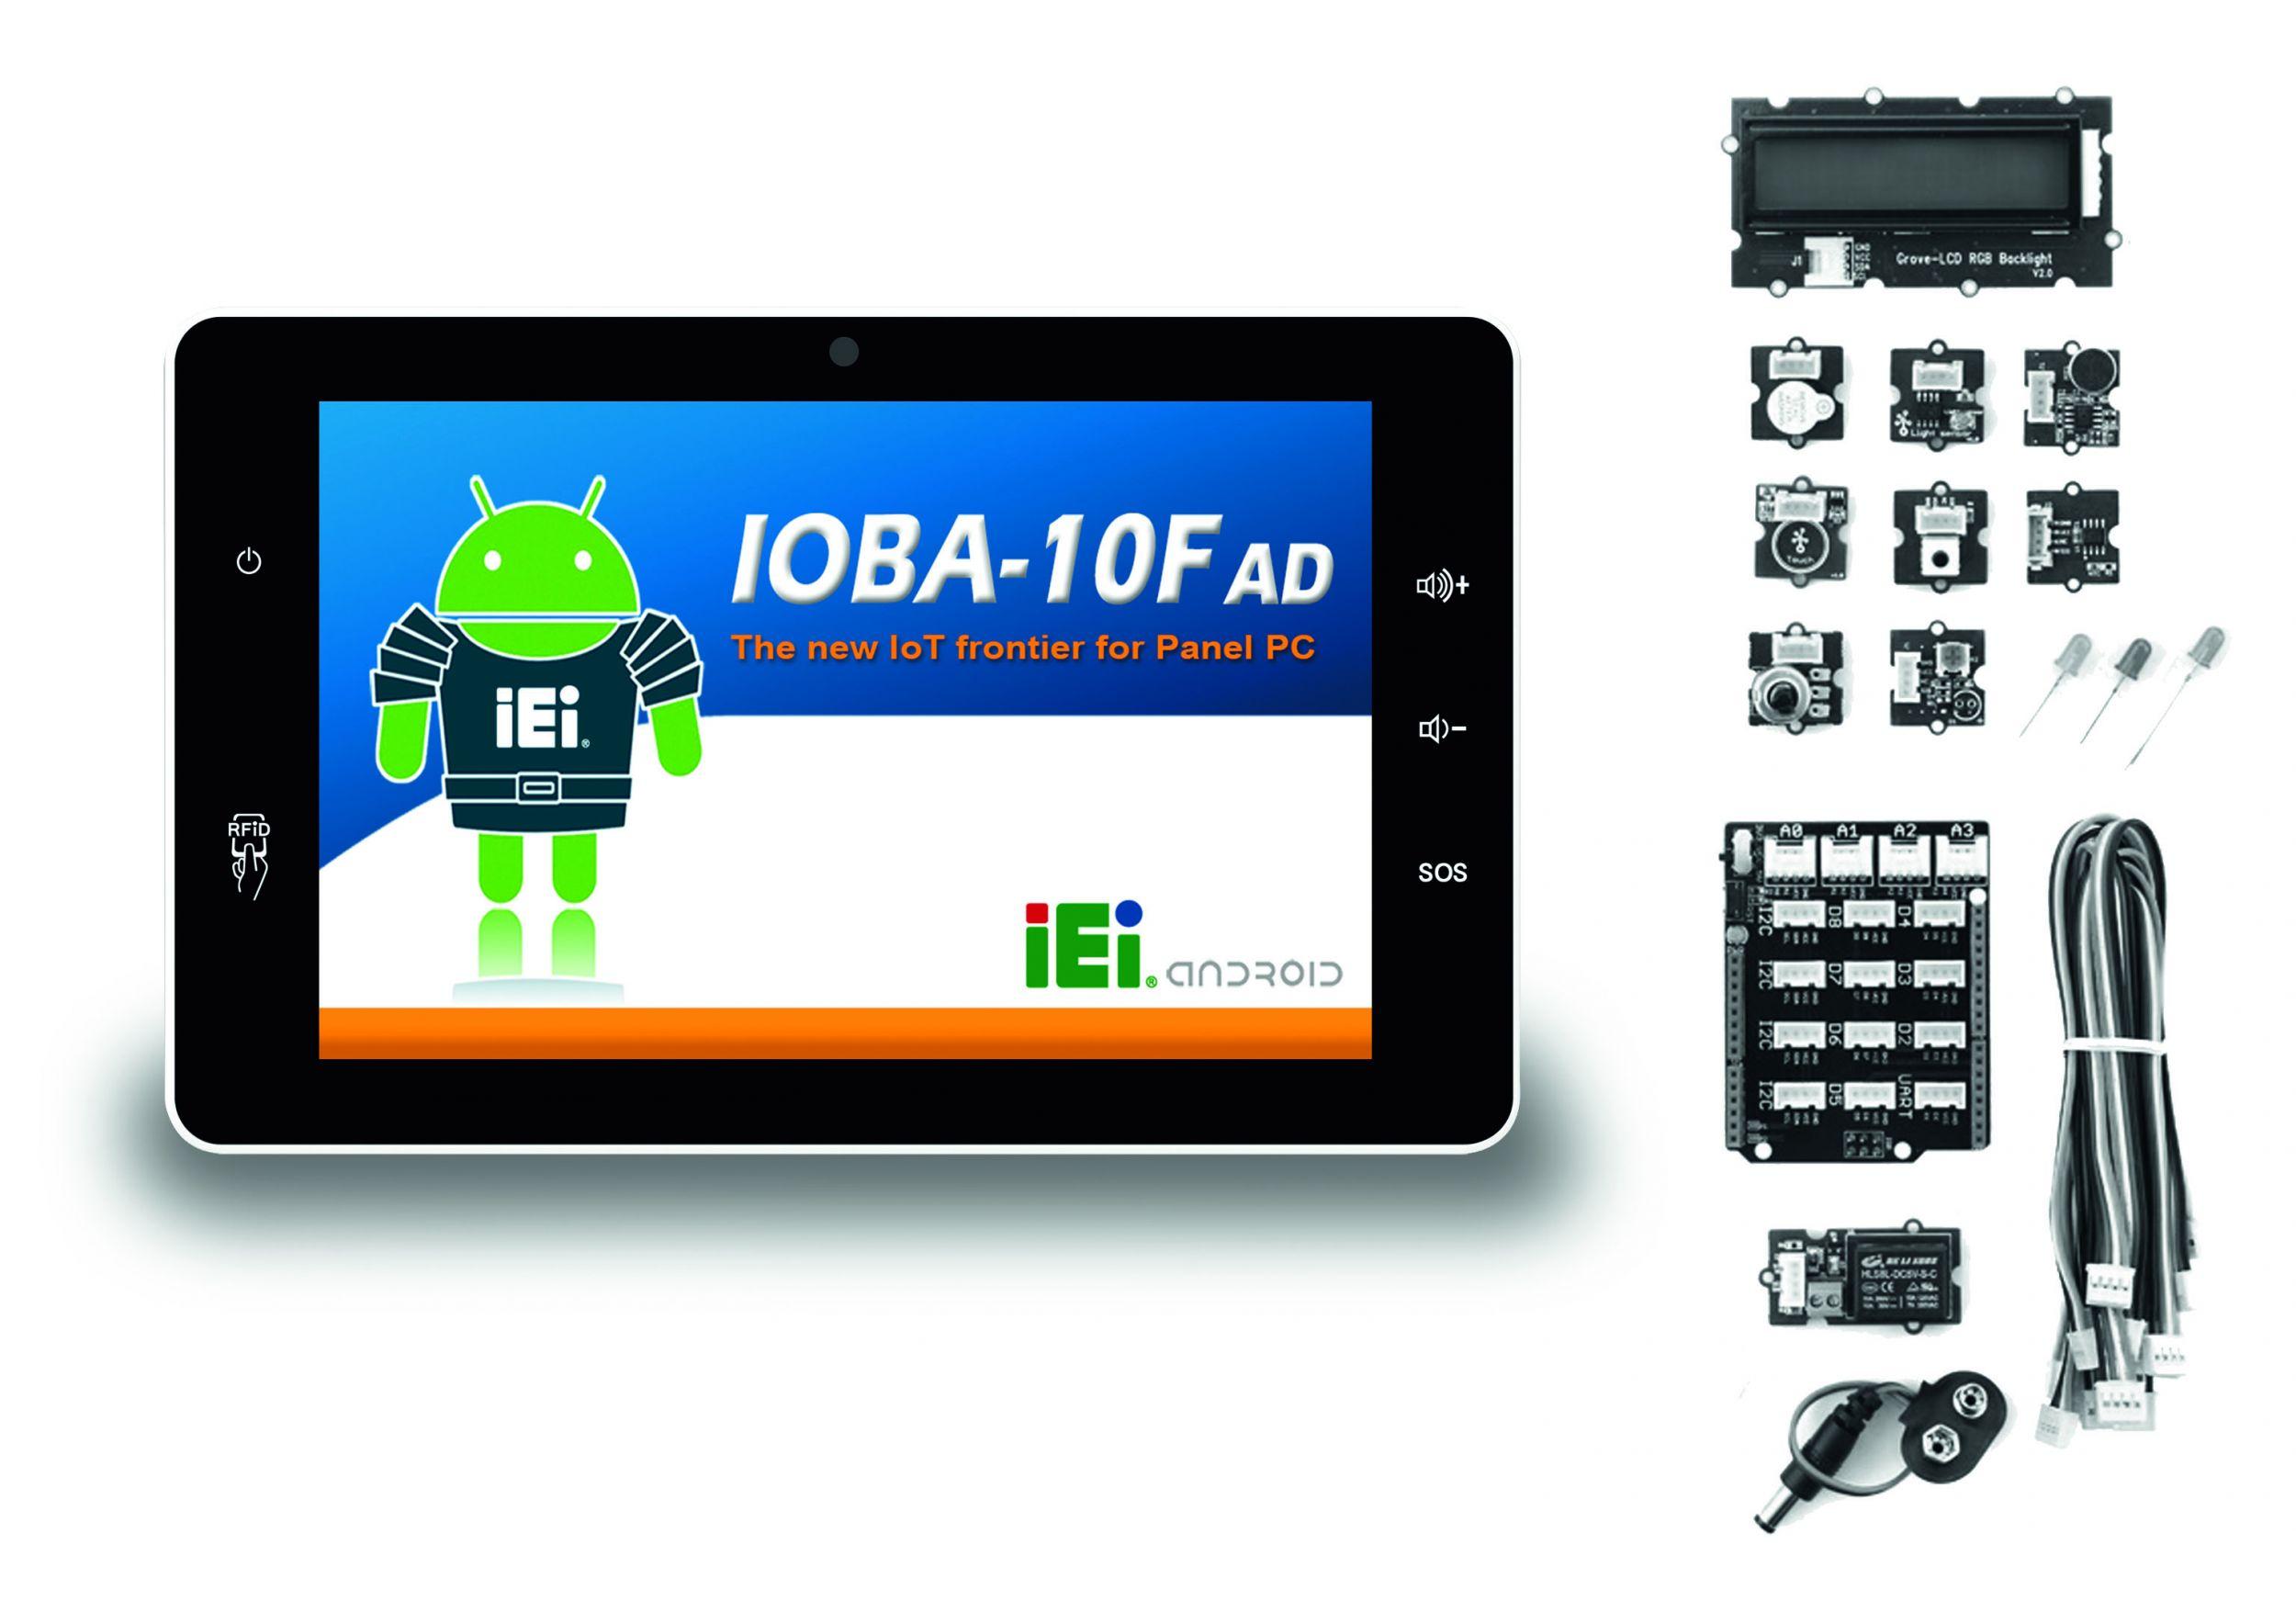 Smarte Gebäudeautomation mit IoT-Sensorik